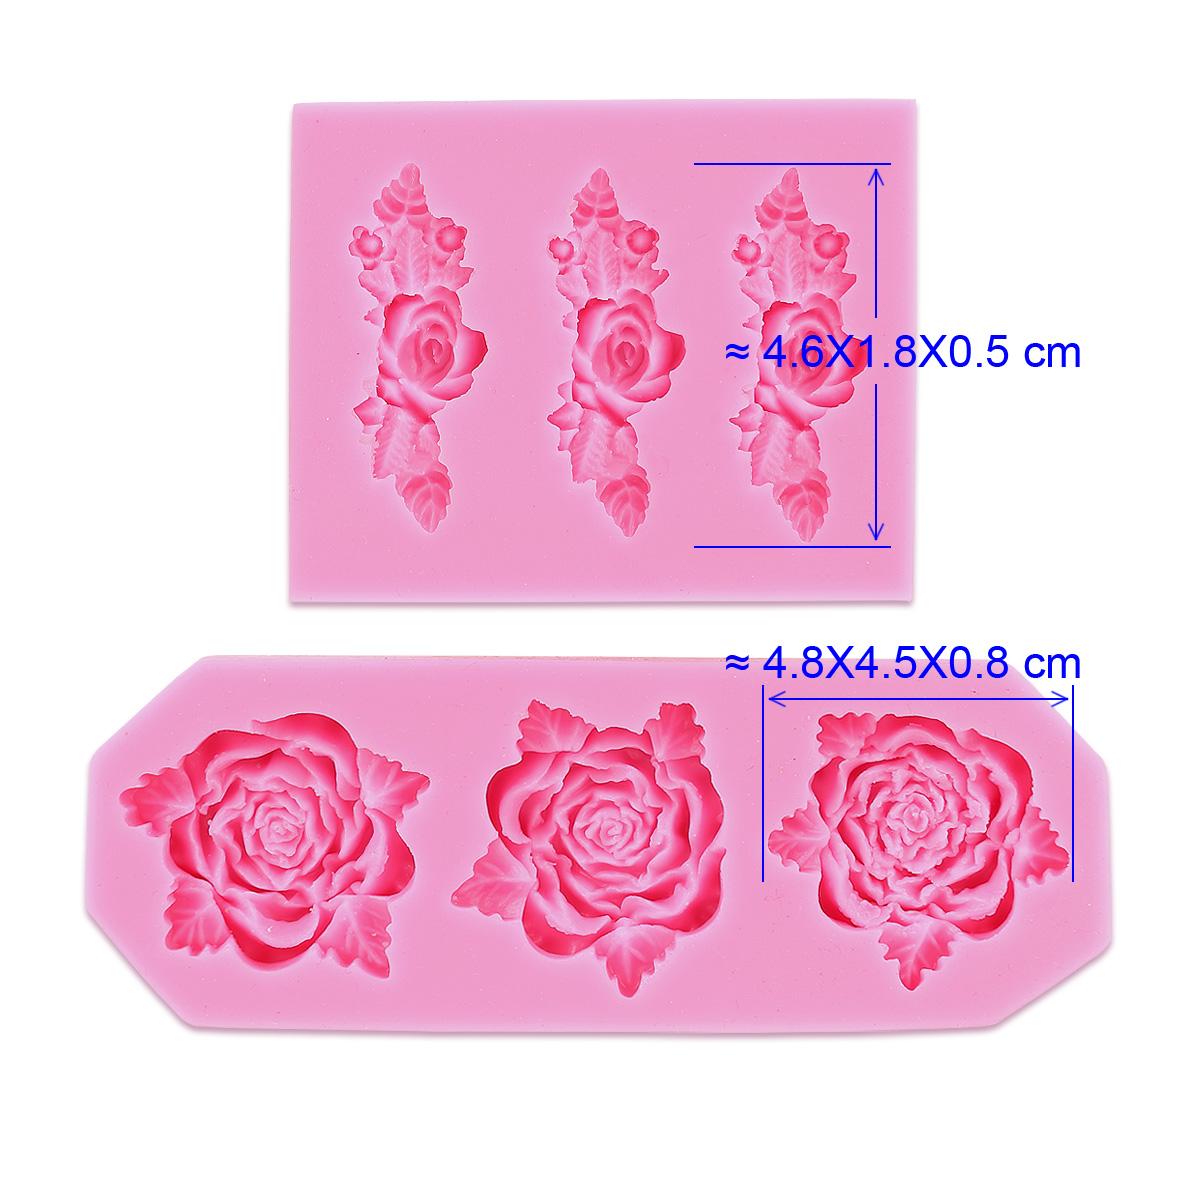 2 x rose silikon form ausstechformen ausstecher torten deko marzipan fondant ebay. Black Bedroom Furniture Sets. Home Design Ideas